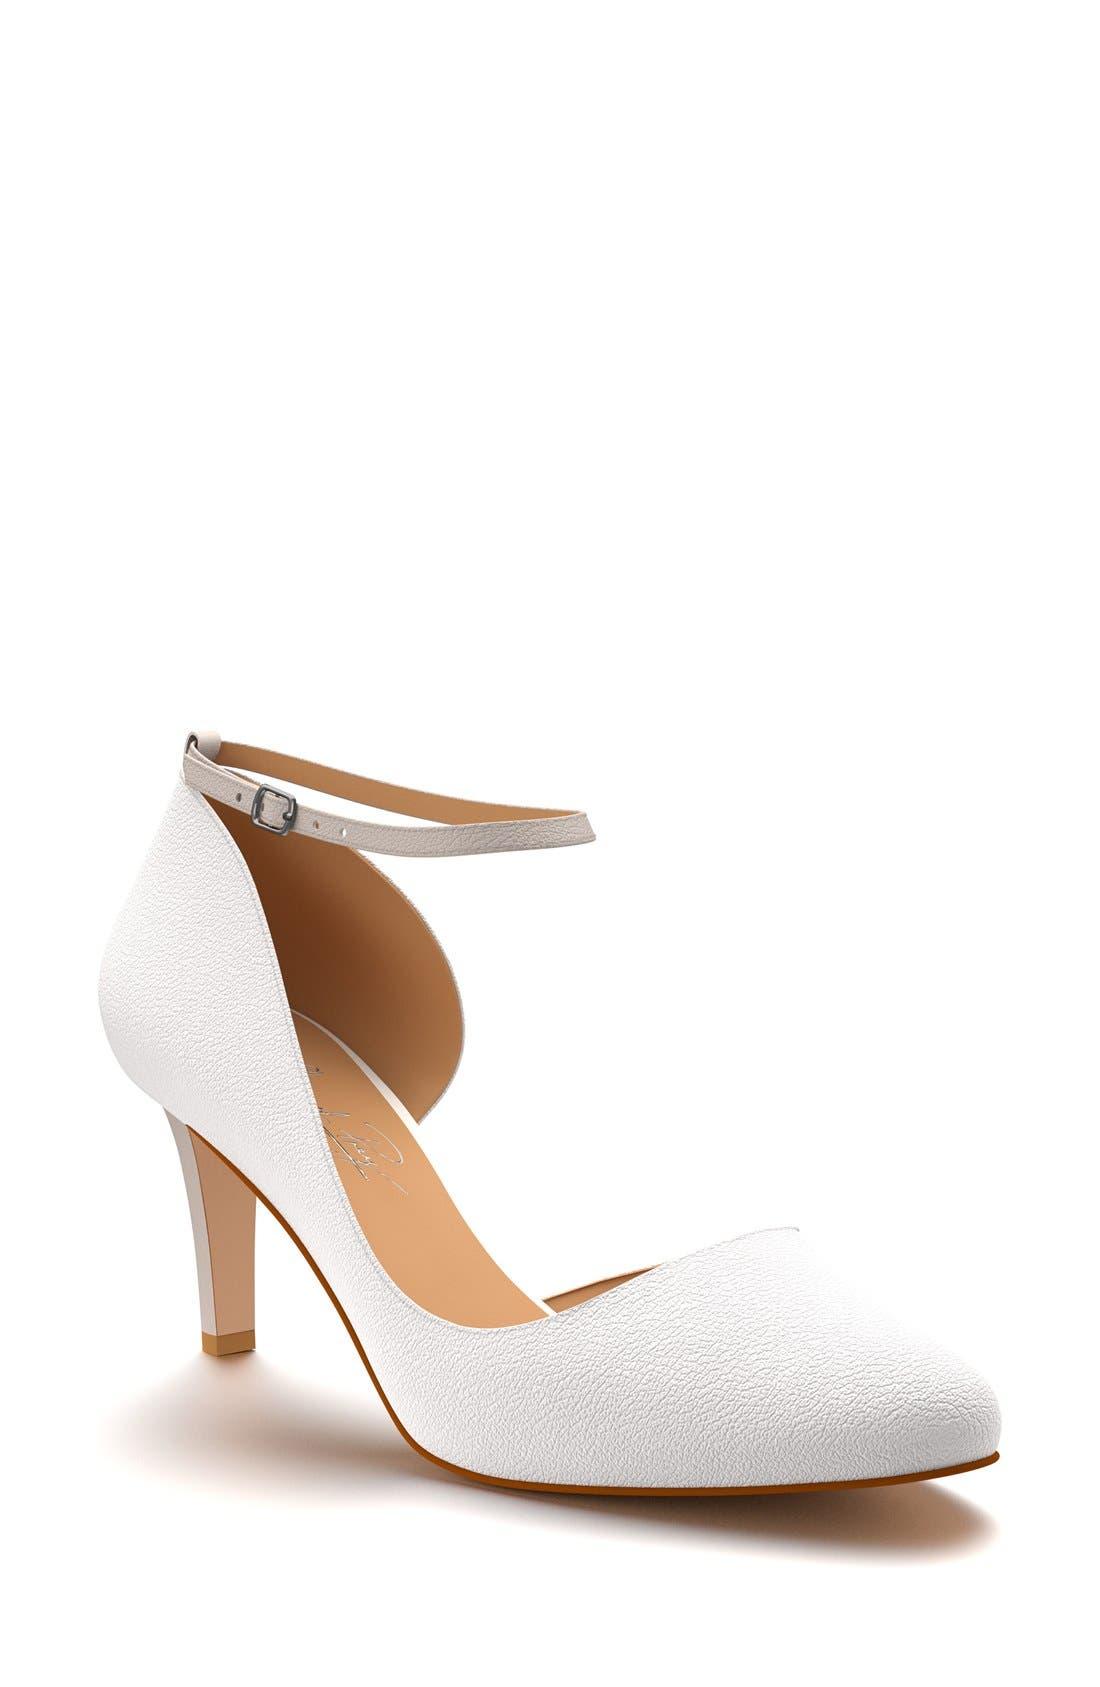 Shoes of Prey Women's Ankle Strap Pump DtzPUOEK